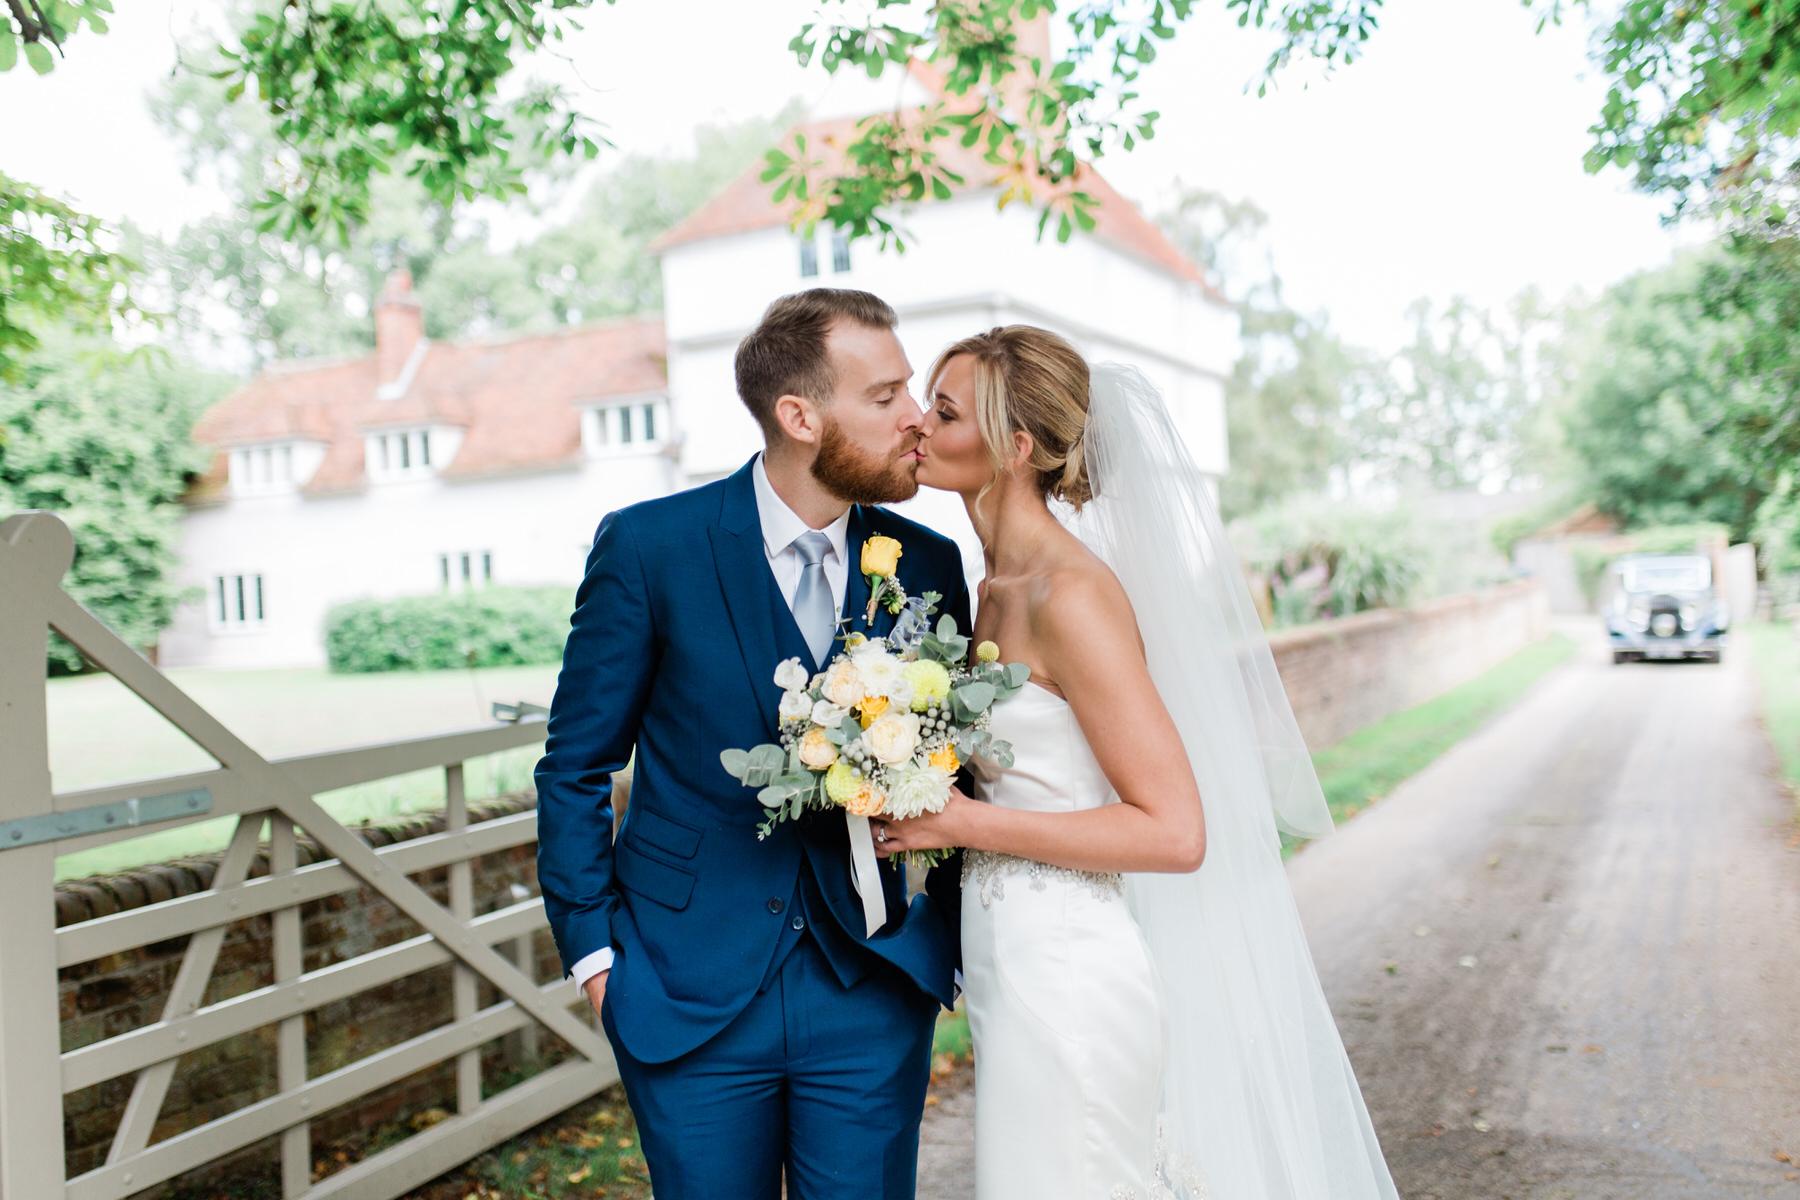 Colchester wedding